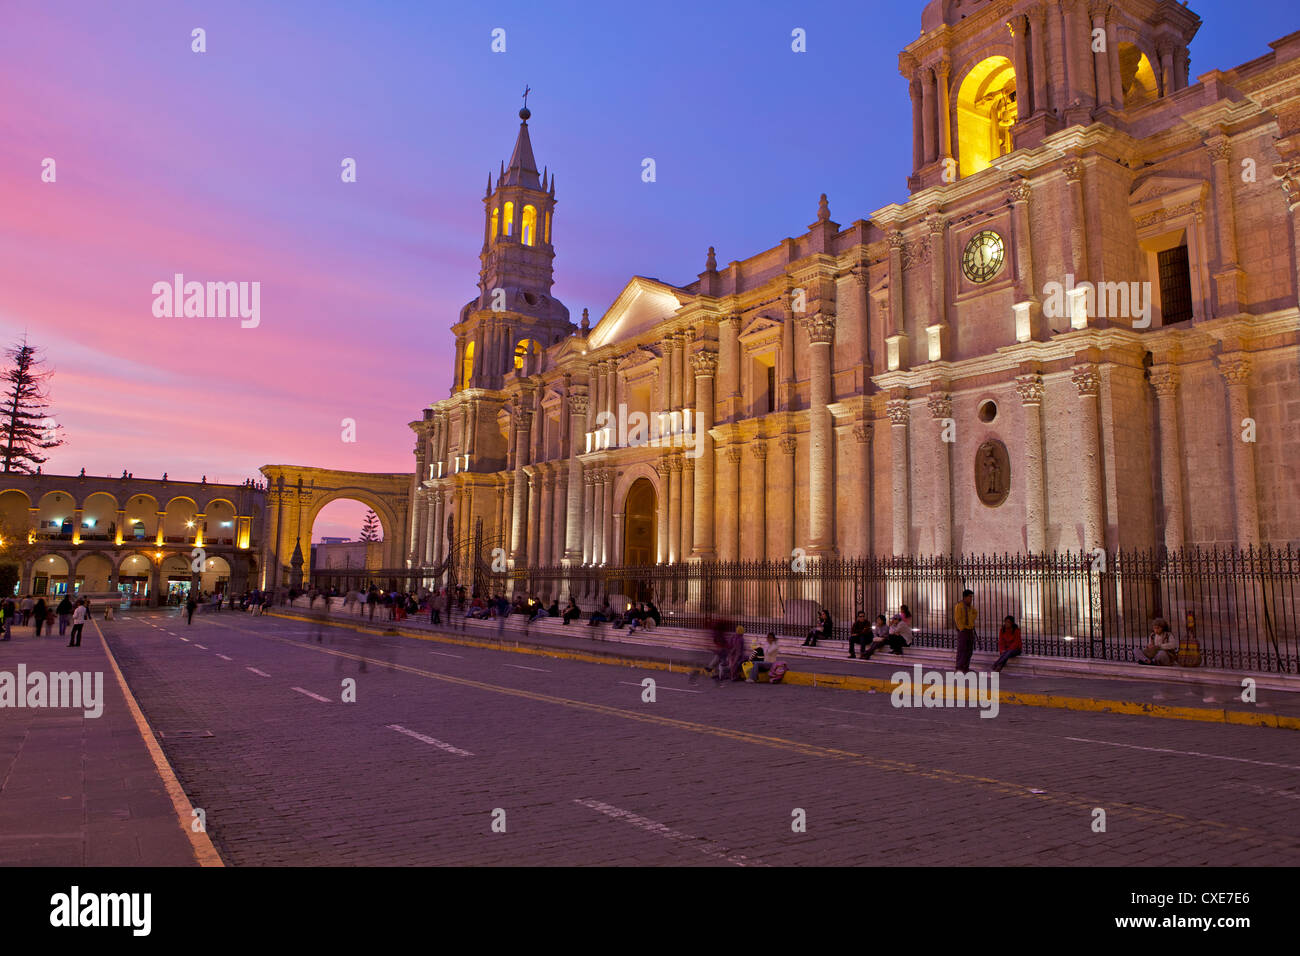 Arequipa Cathedral, Plaza de Armas, Arequipa, peru, South America Stock Photo